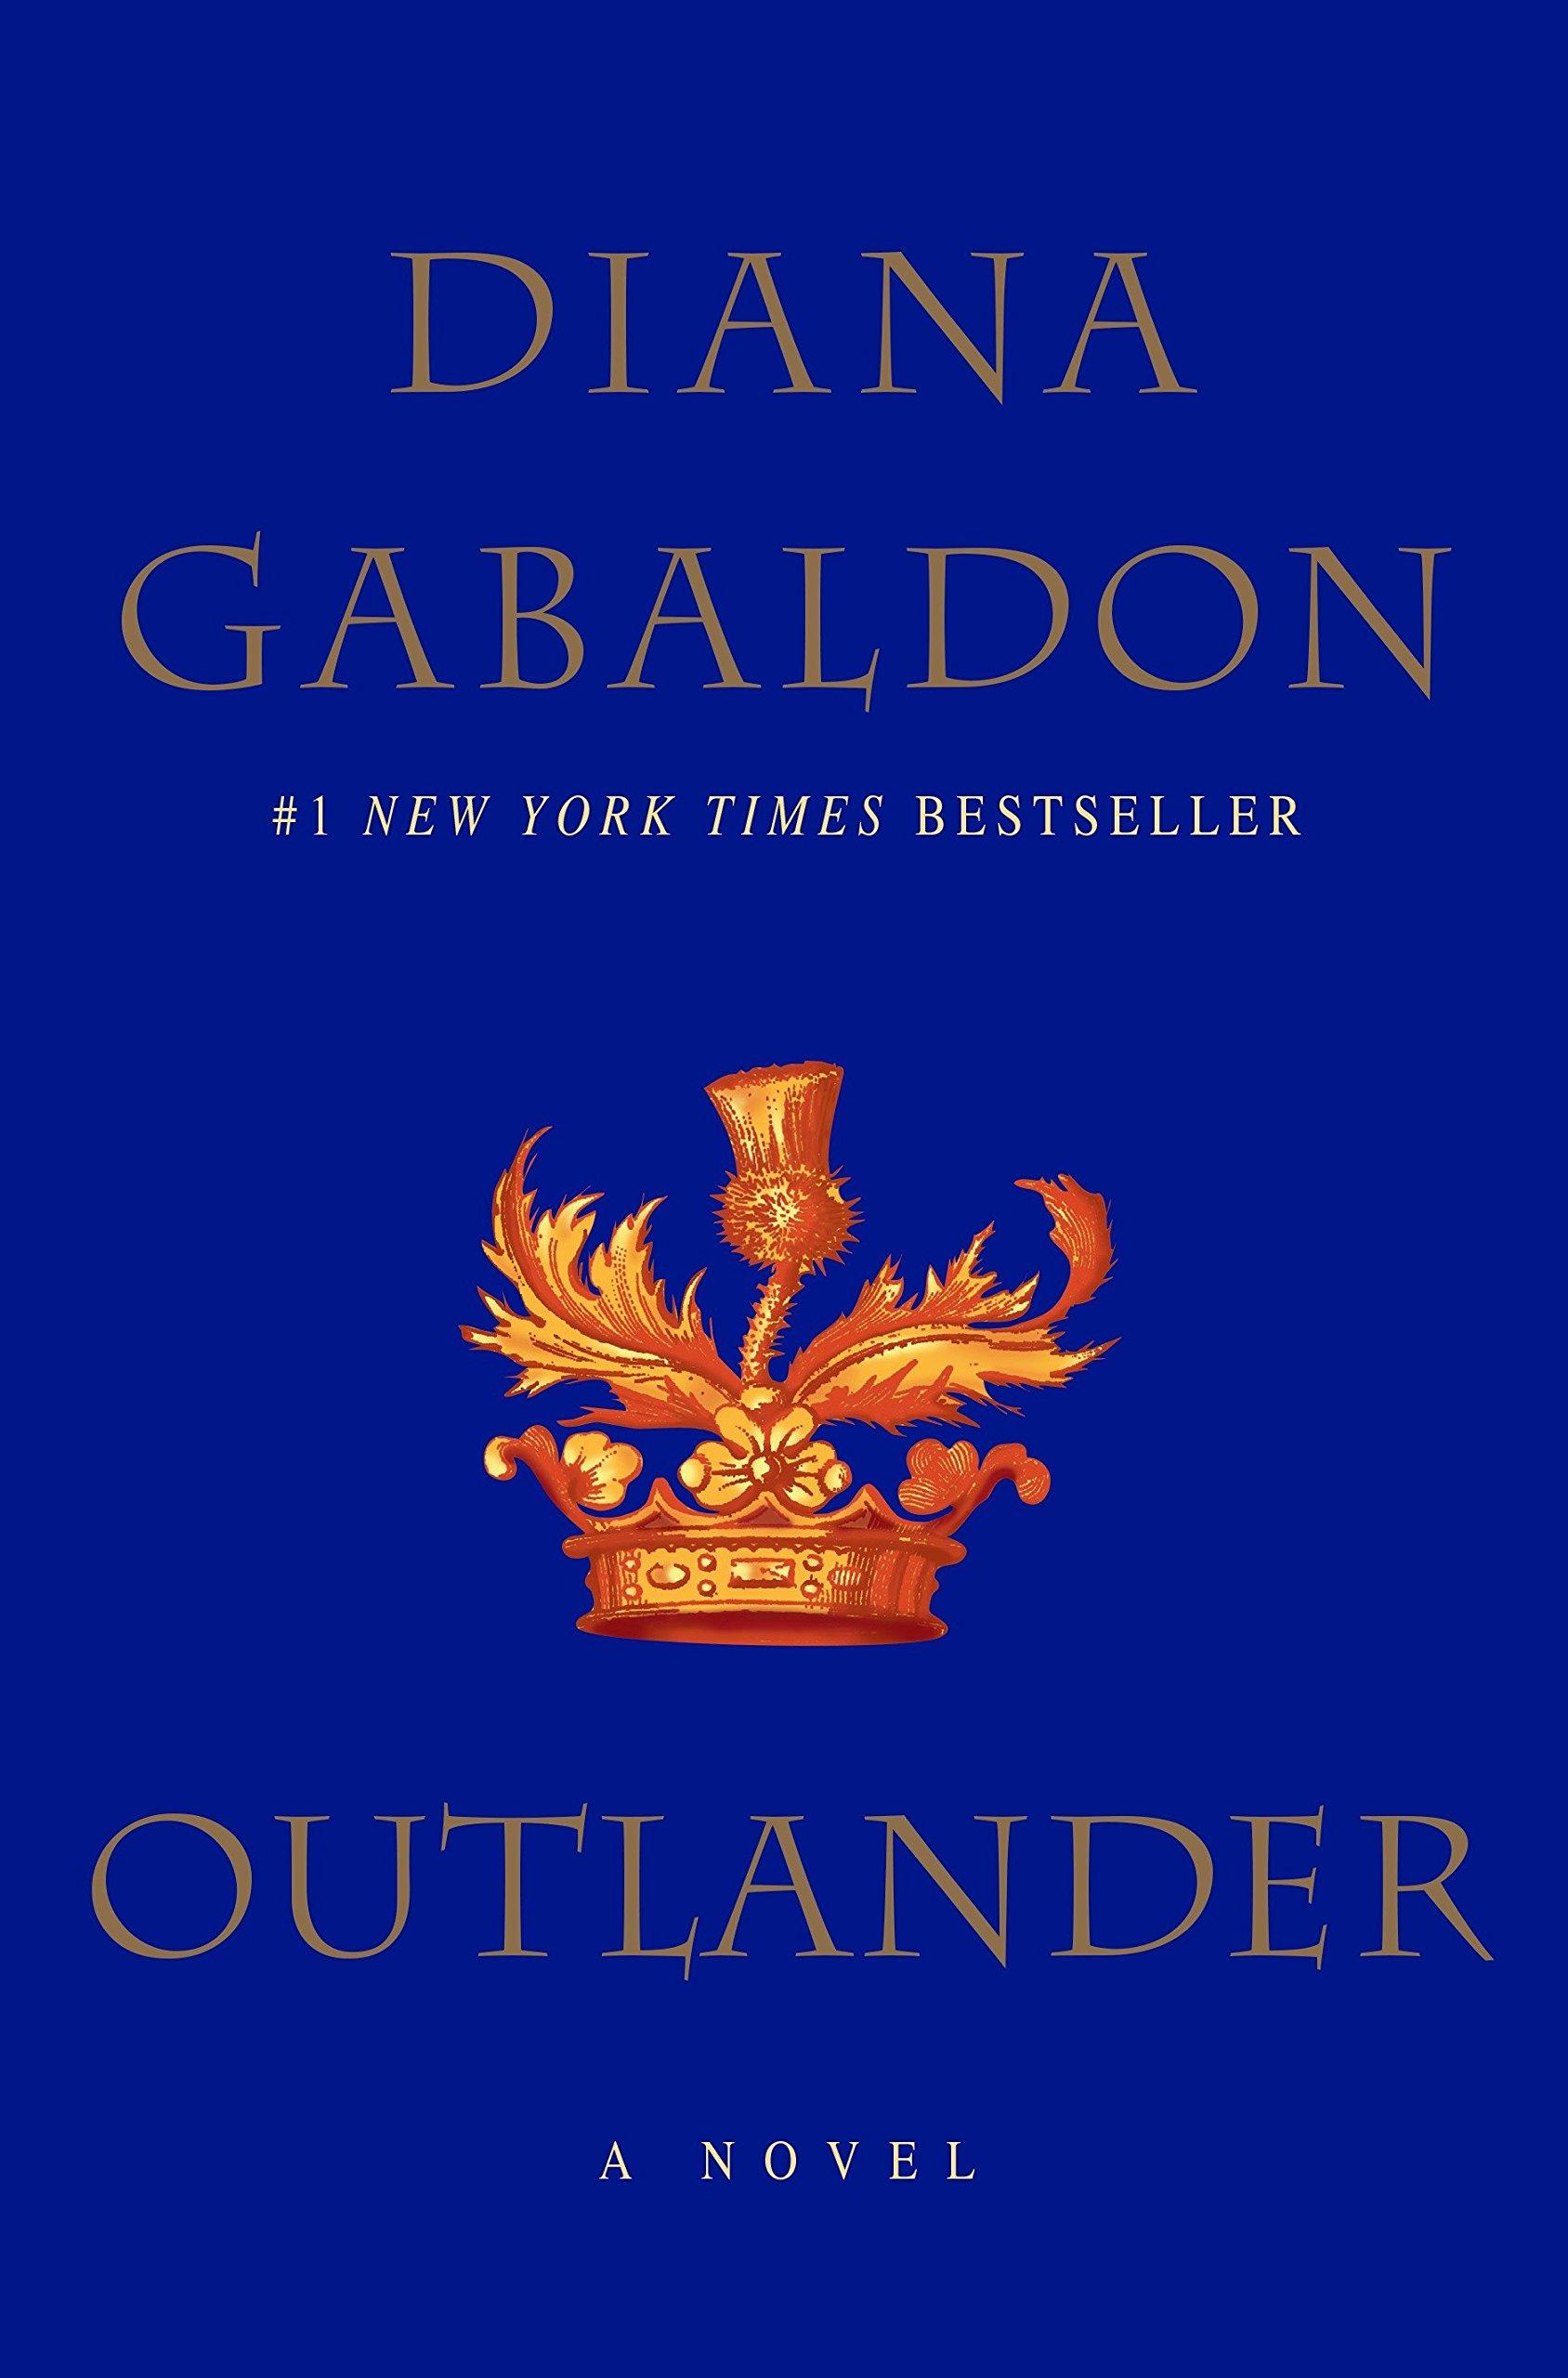 outlander order of books